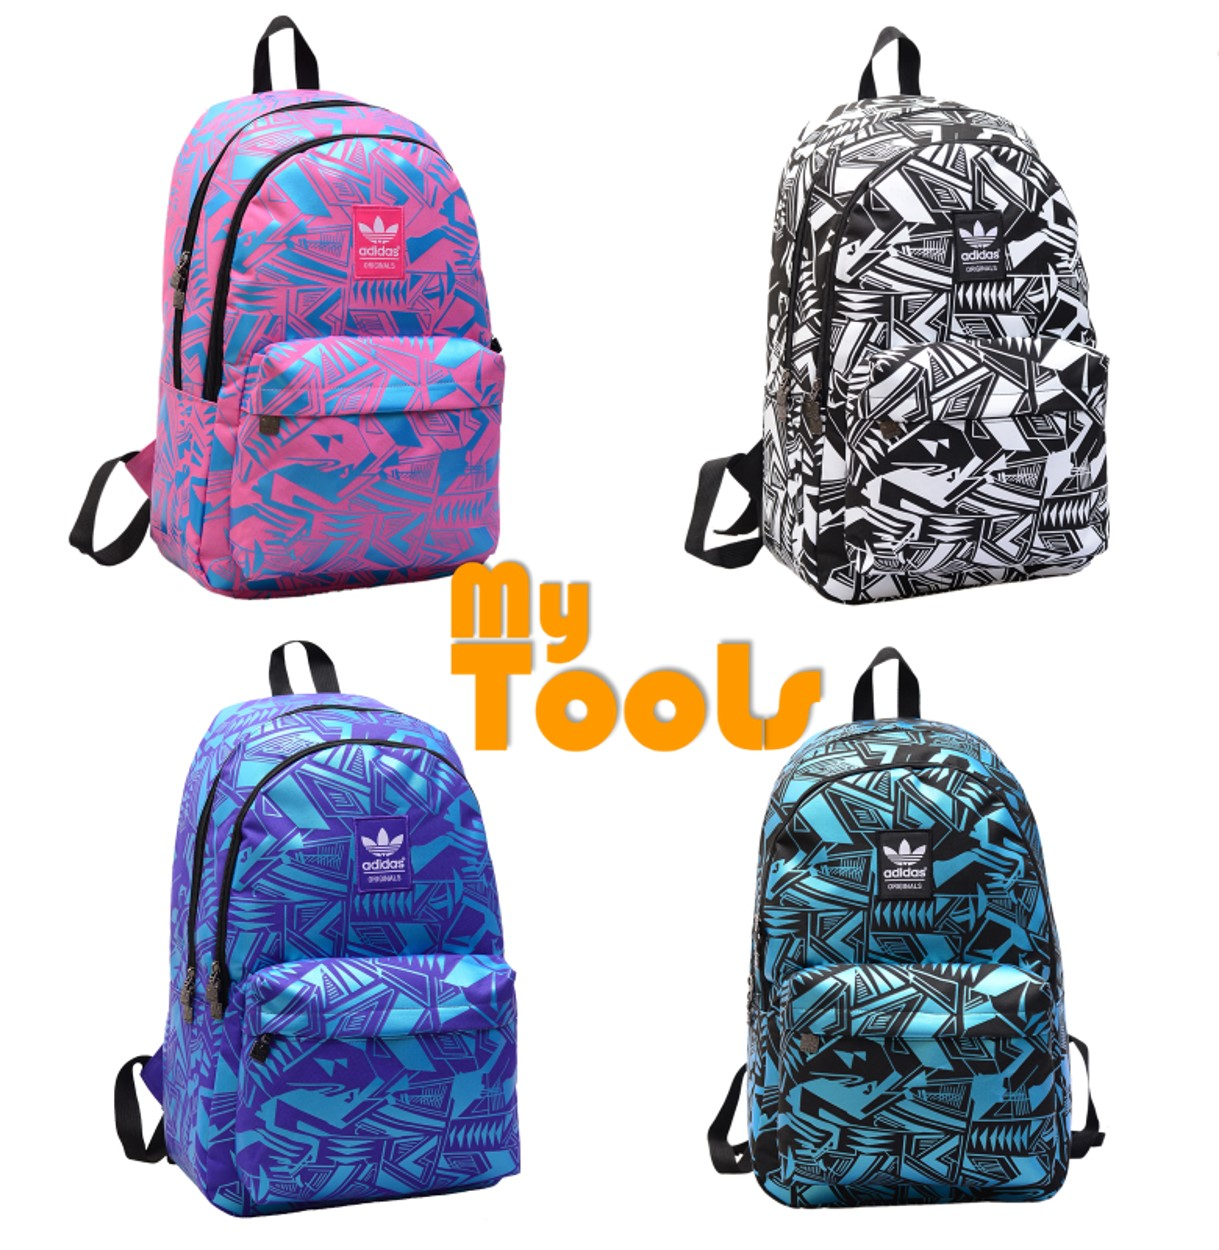 Adidas Stylish Graphic Fashion Sport Travel School Backpack Bag